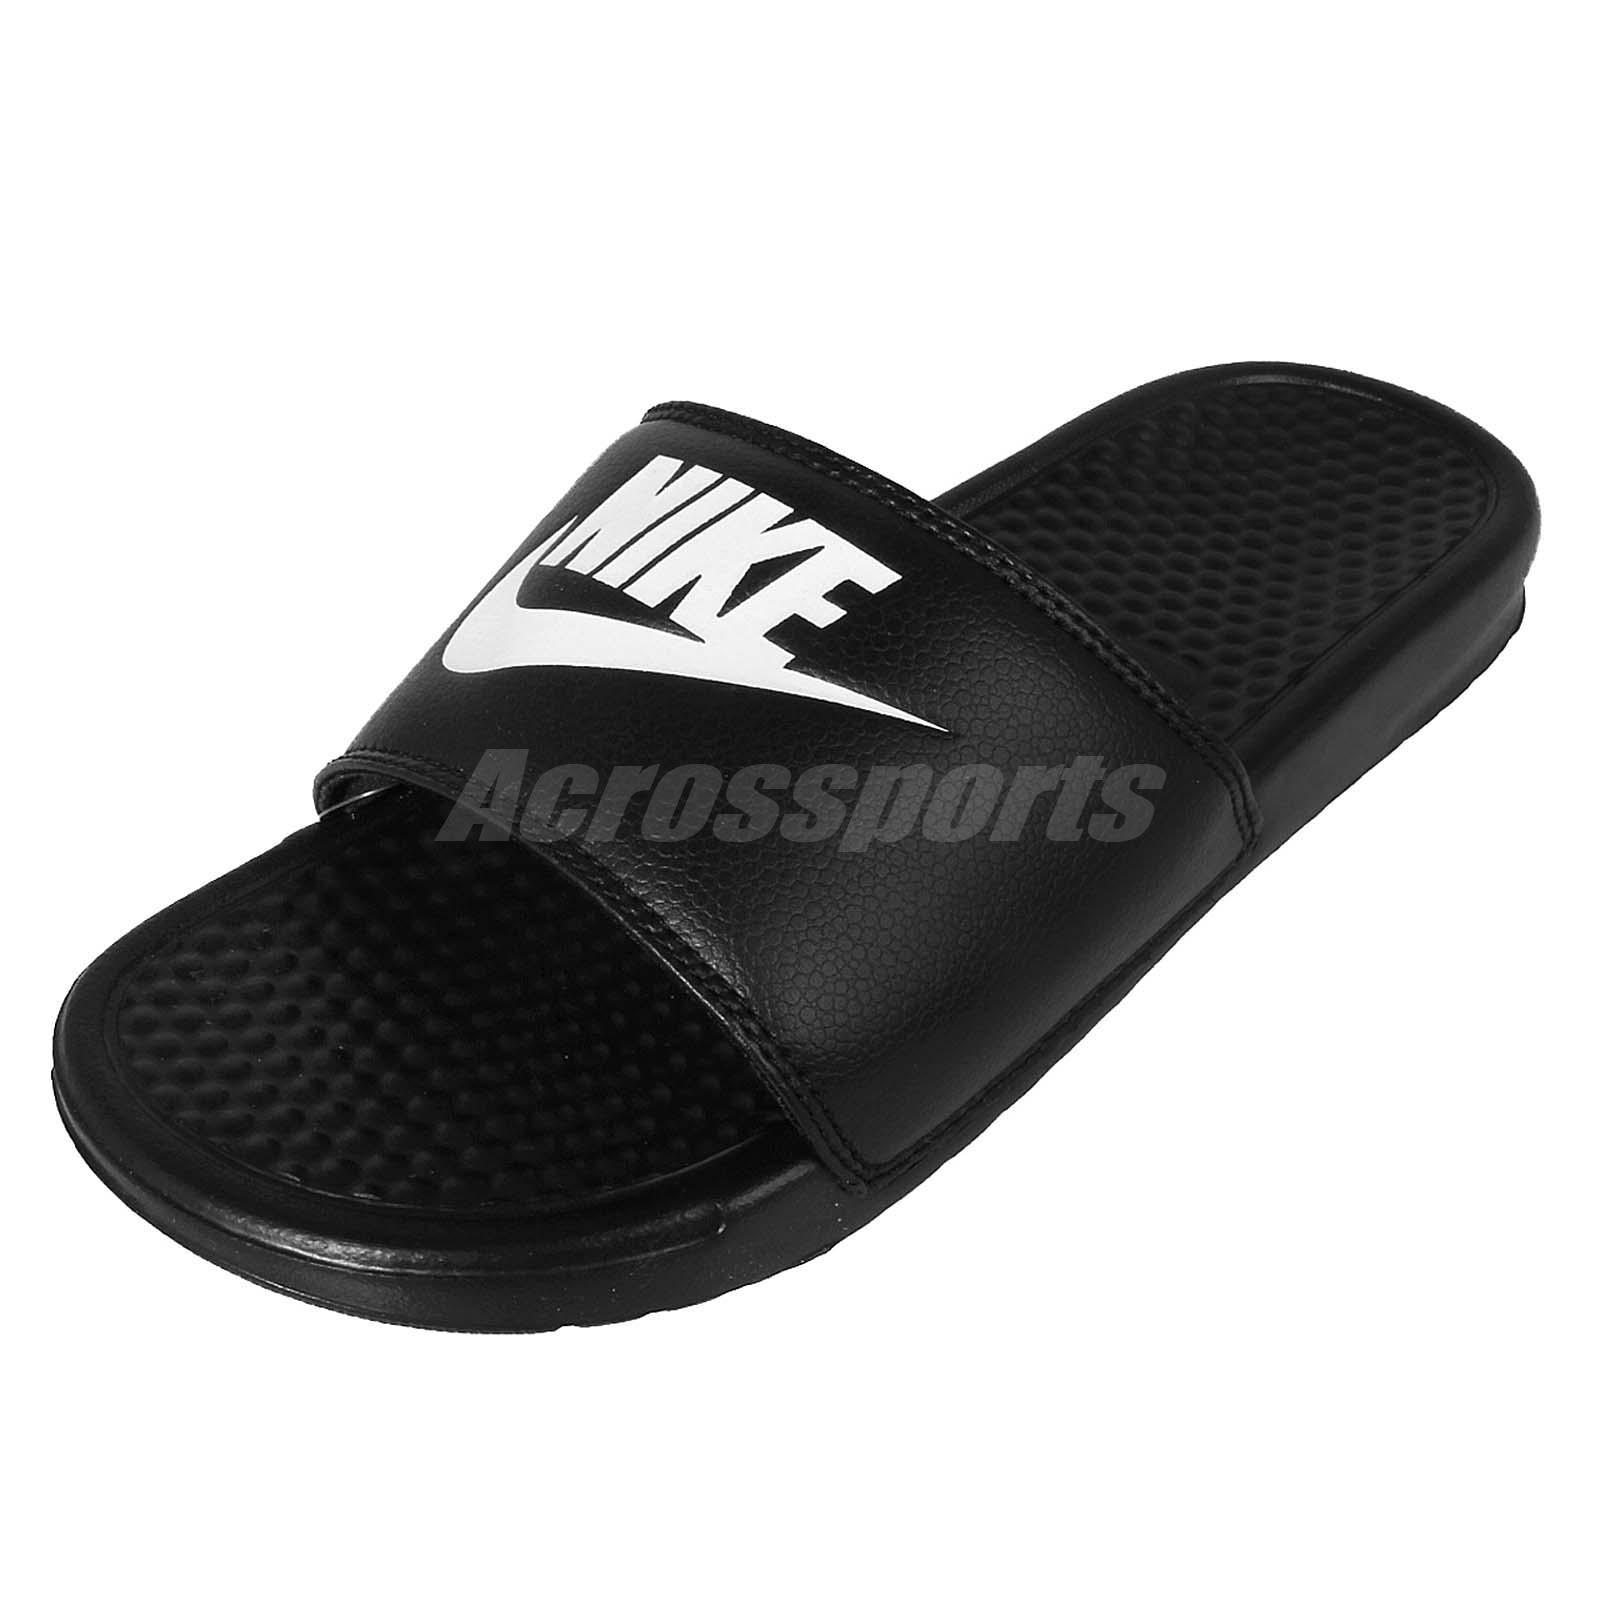 ef4aa05b0 Nike Benassi JDI Black White Men Sports Sandals Slippers Slides 343880-090